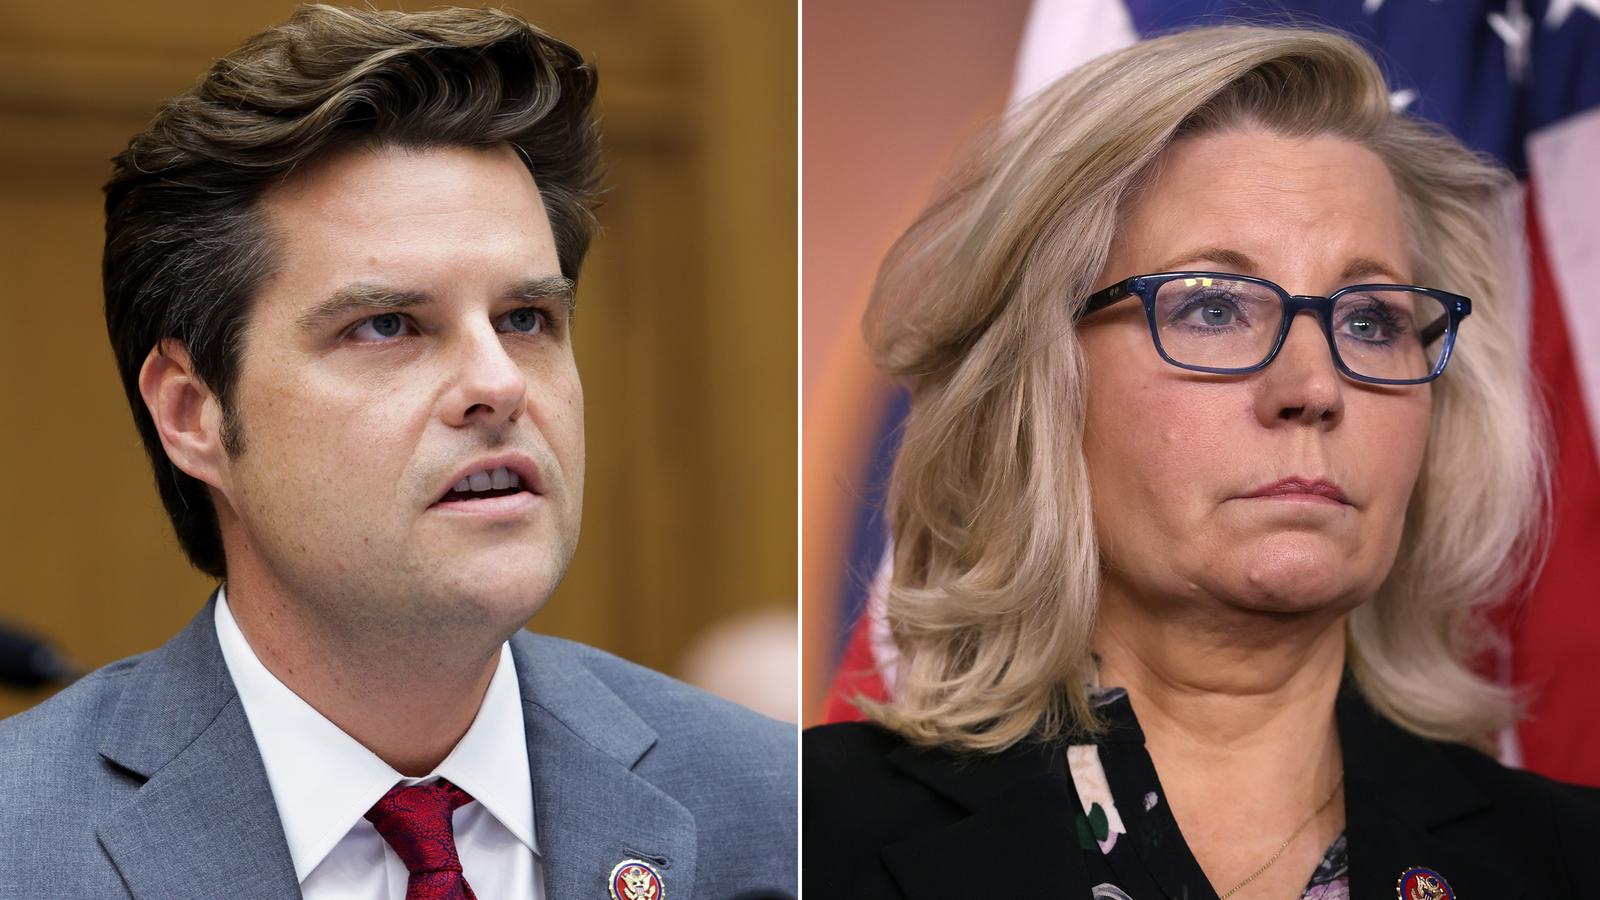 Matt Gaetz to rally Trump faithful to boost MAGA backlash in Liz Cheney's backyard